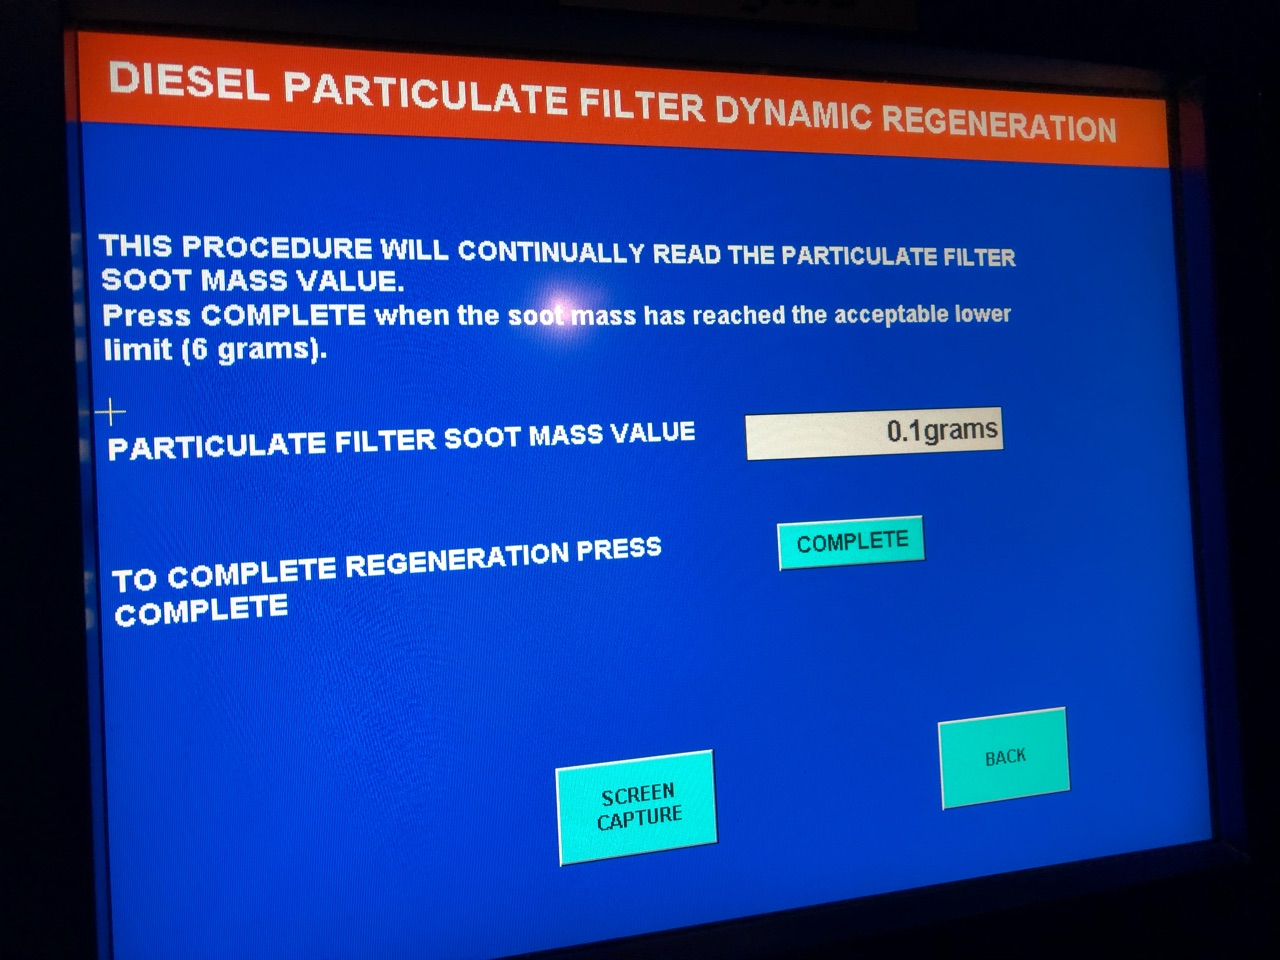 TDV8 4.4 トラブルシューテイング DPF詰まり 吹けあがらない DIESEL PARTICULATE ハイクオリティ ディーゼル粒子フィルタ 値引き DYNAMIC ダイナミック再生 FILTER 高速走行が少ない方向けメンテナンスご入庫時に行えるサービス REGENERATION